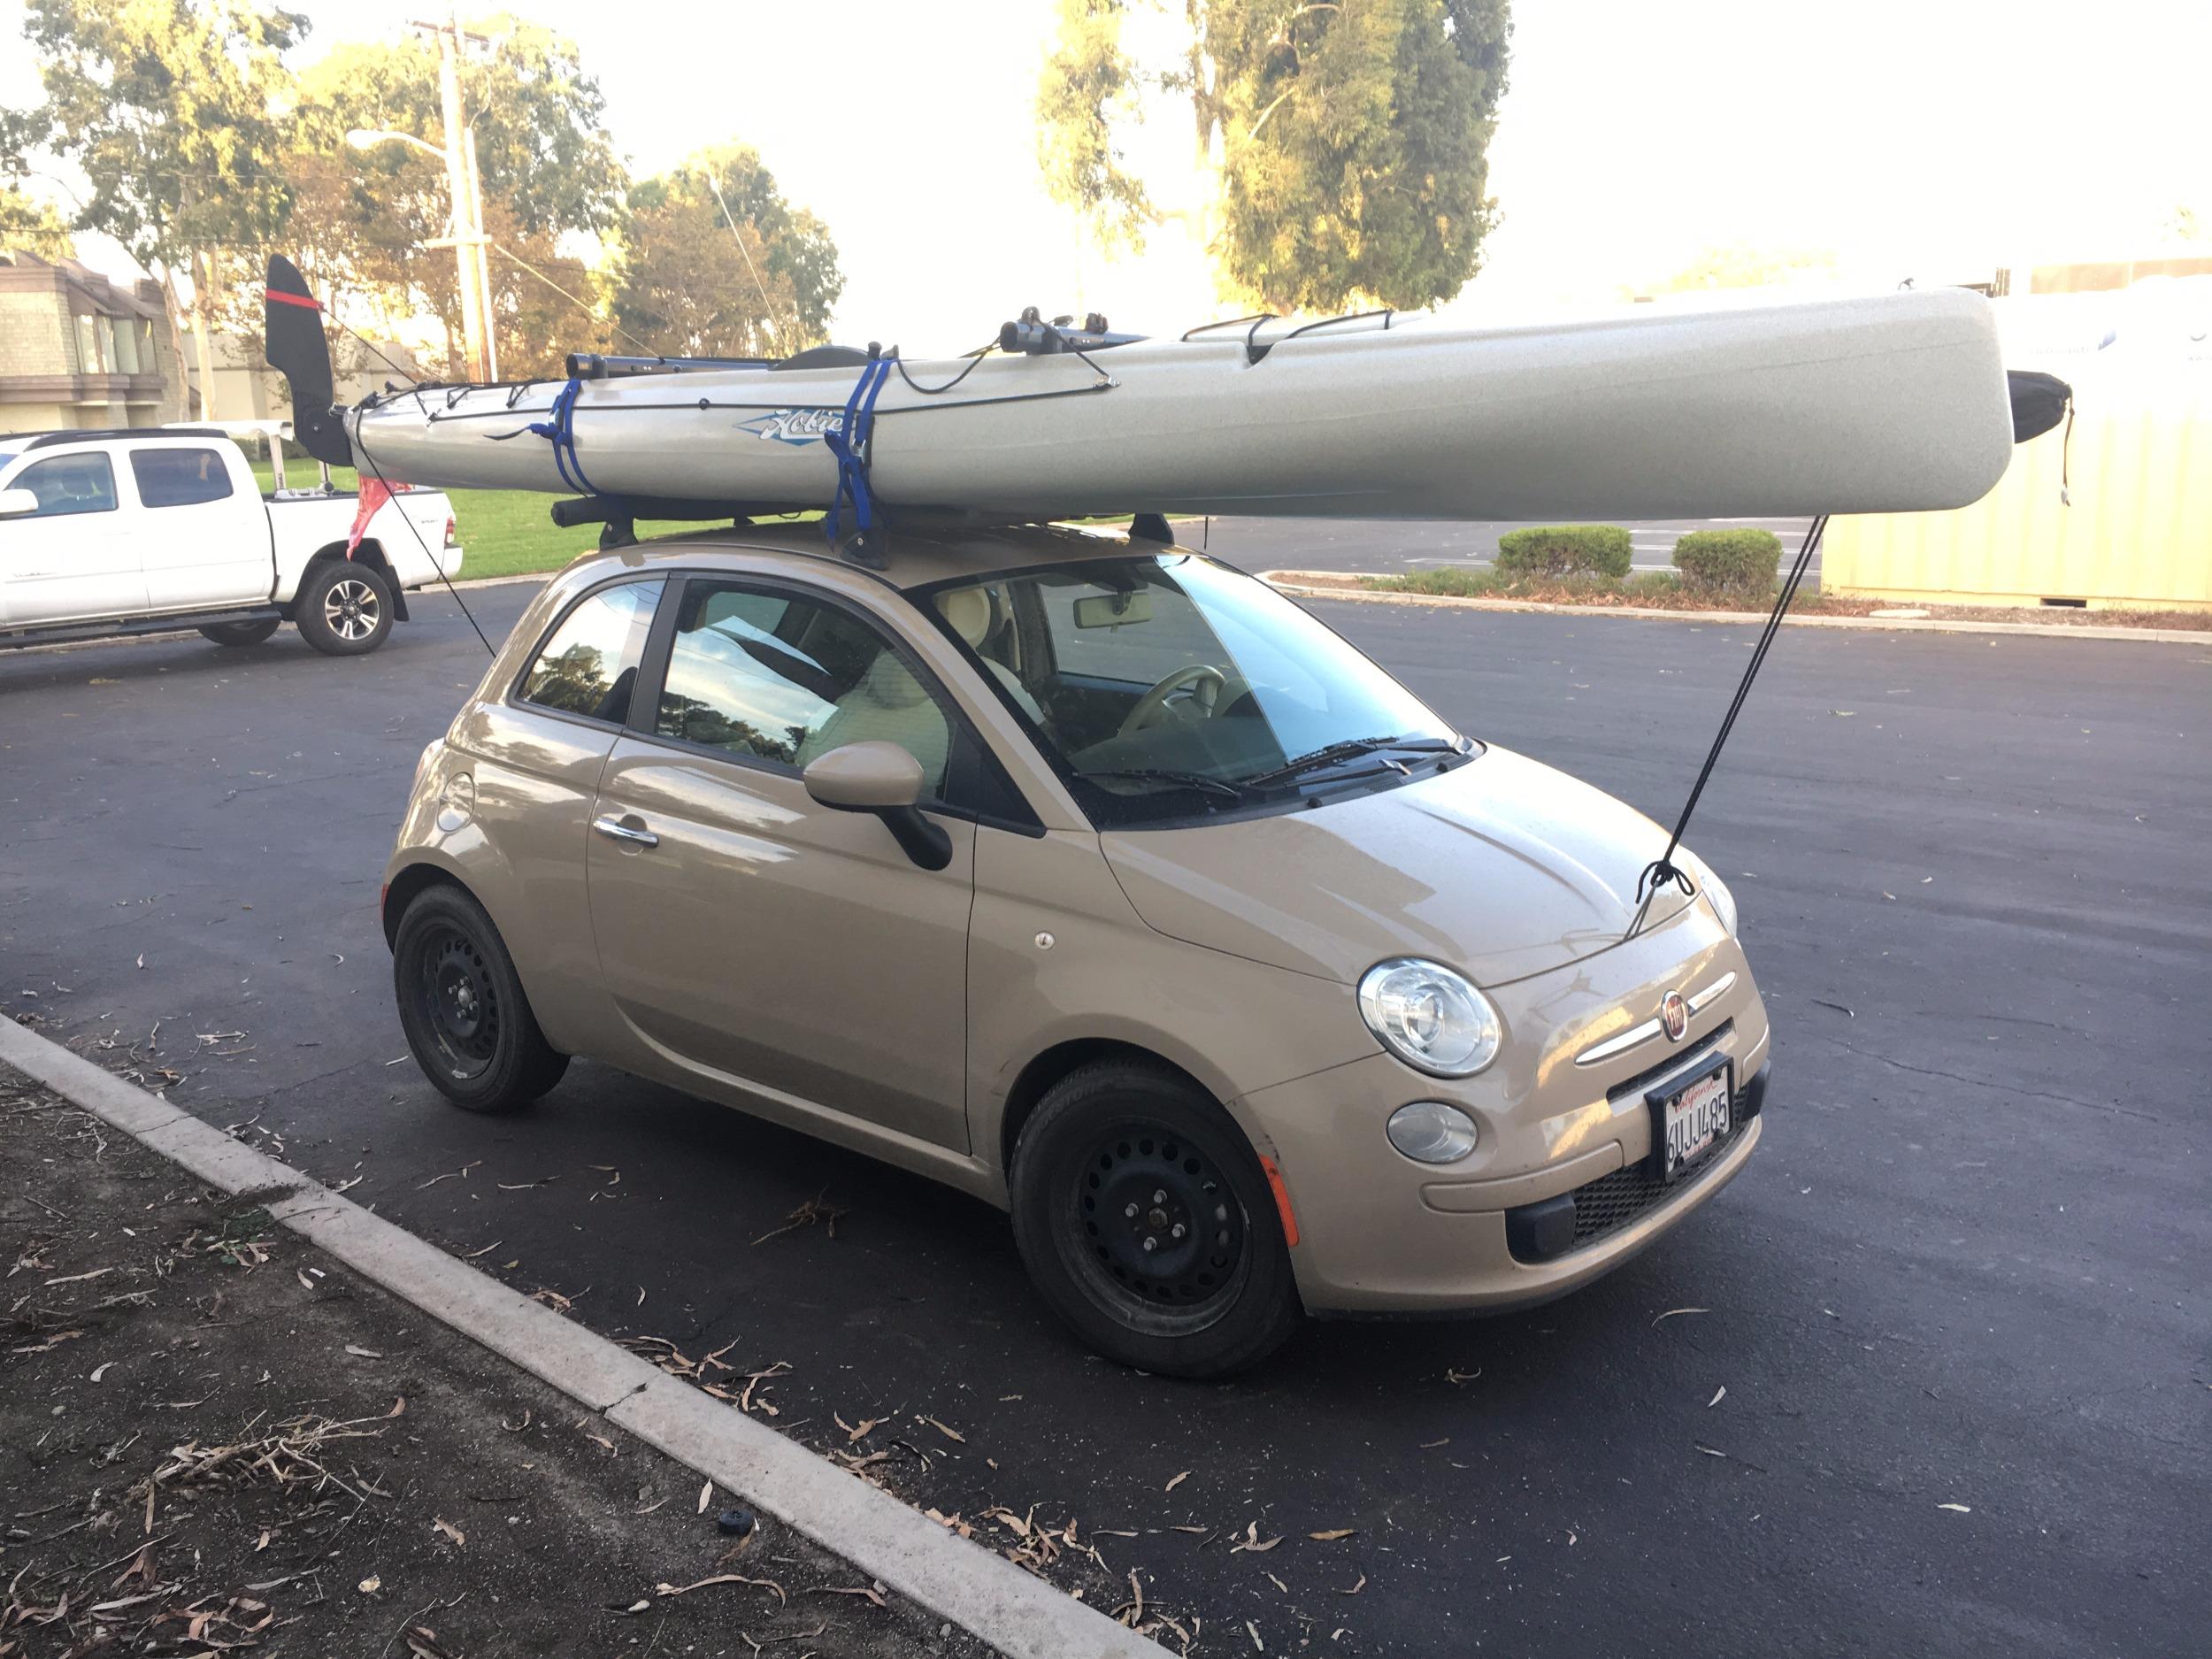 hobie adventure kayak island mirage kayaks